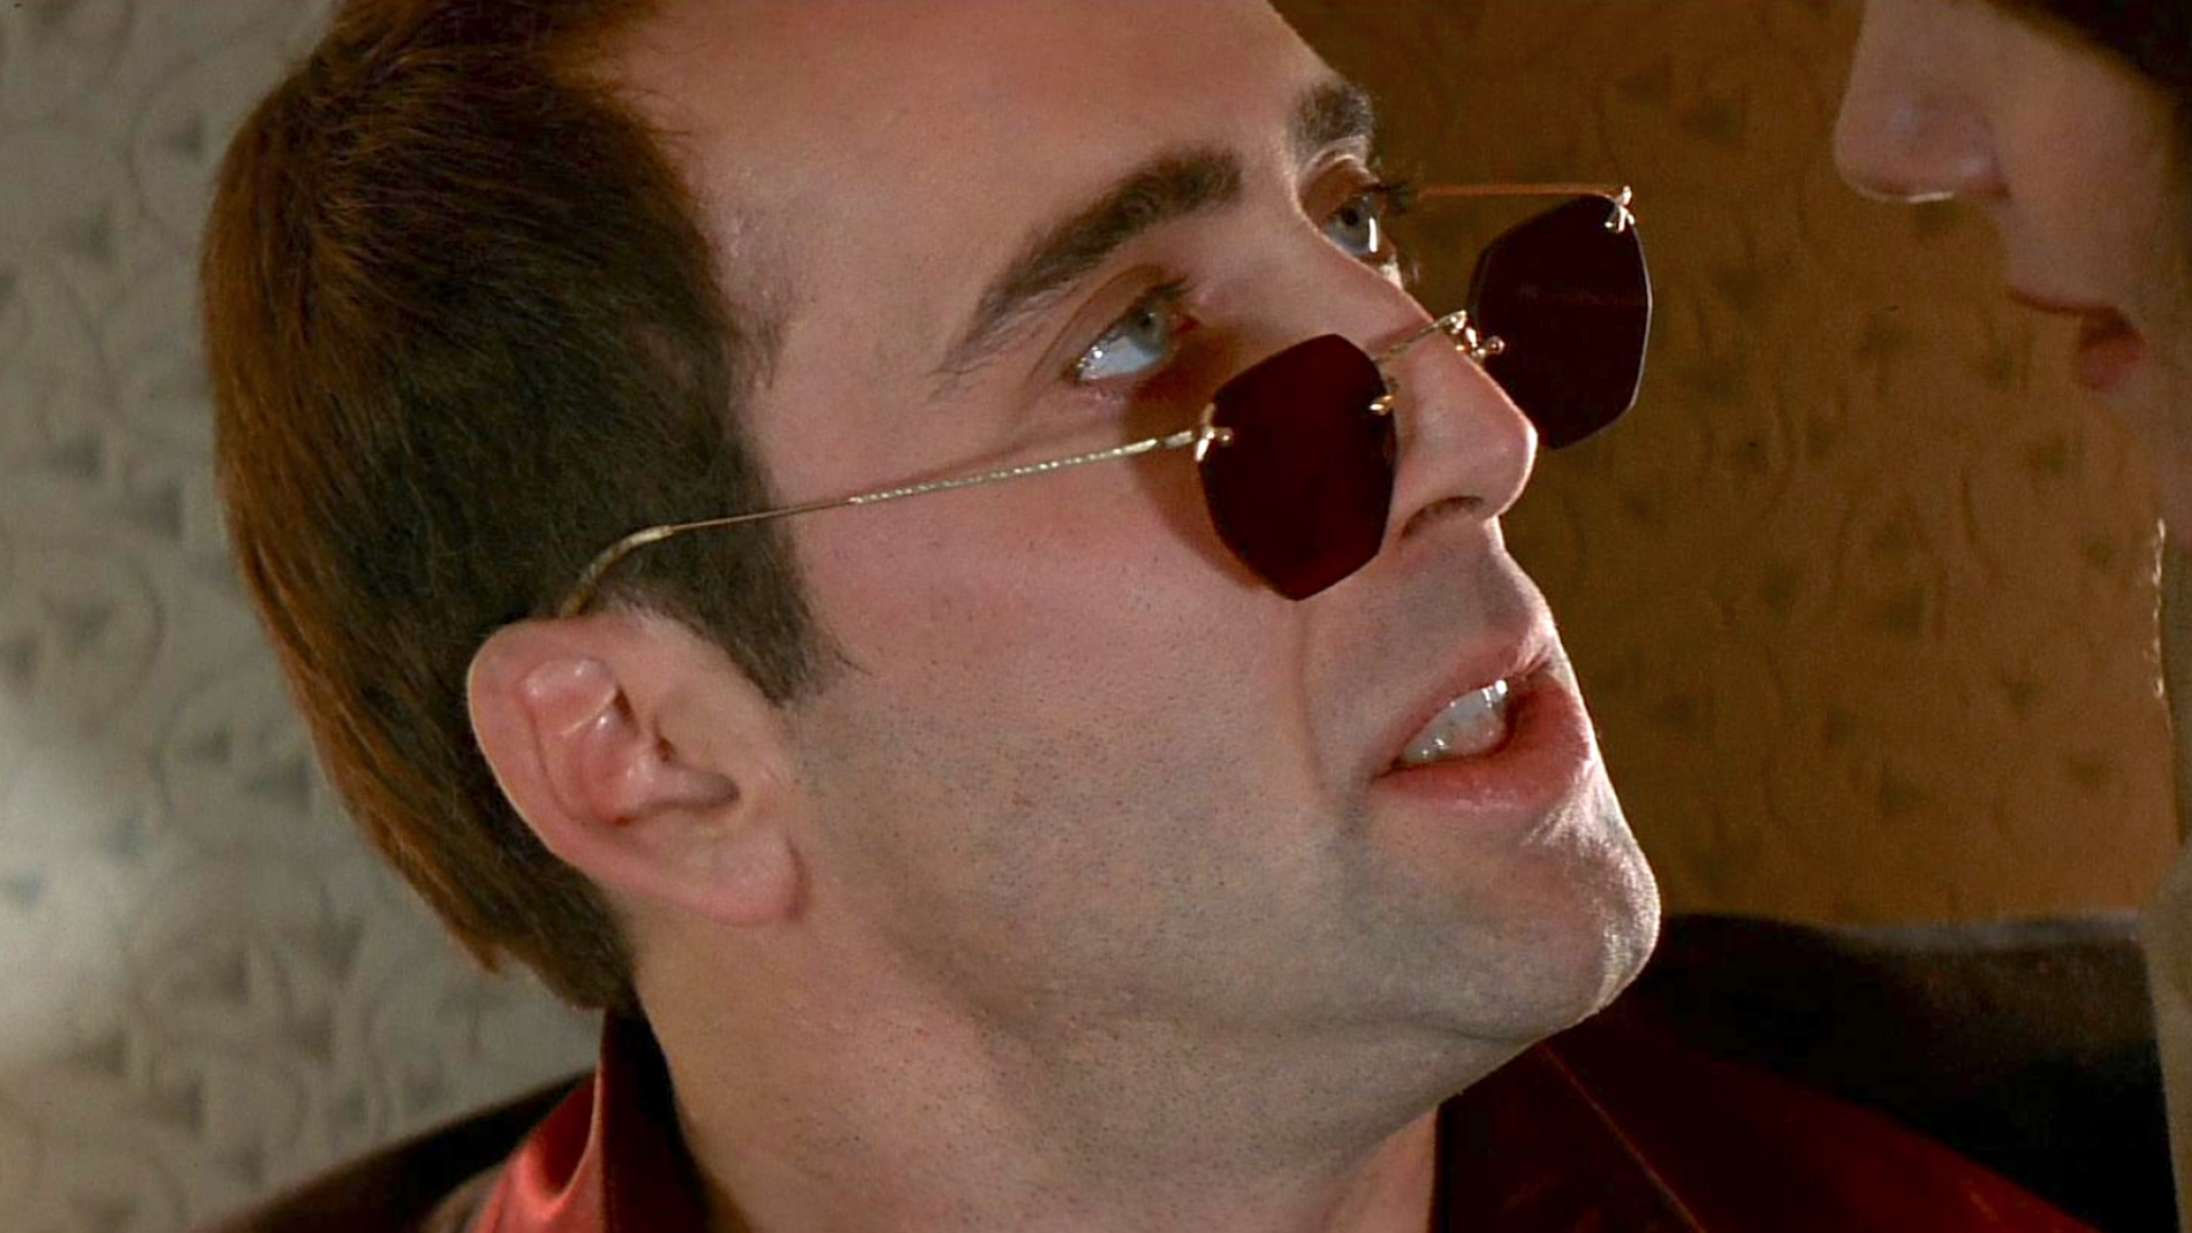 I vanvittige 'Face/Off' gjorde Nicolas Cage vildskaben mainstream